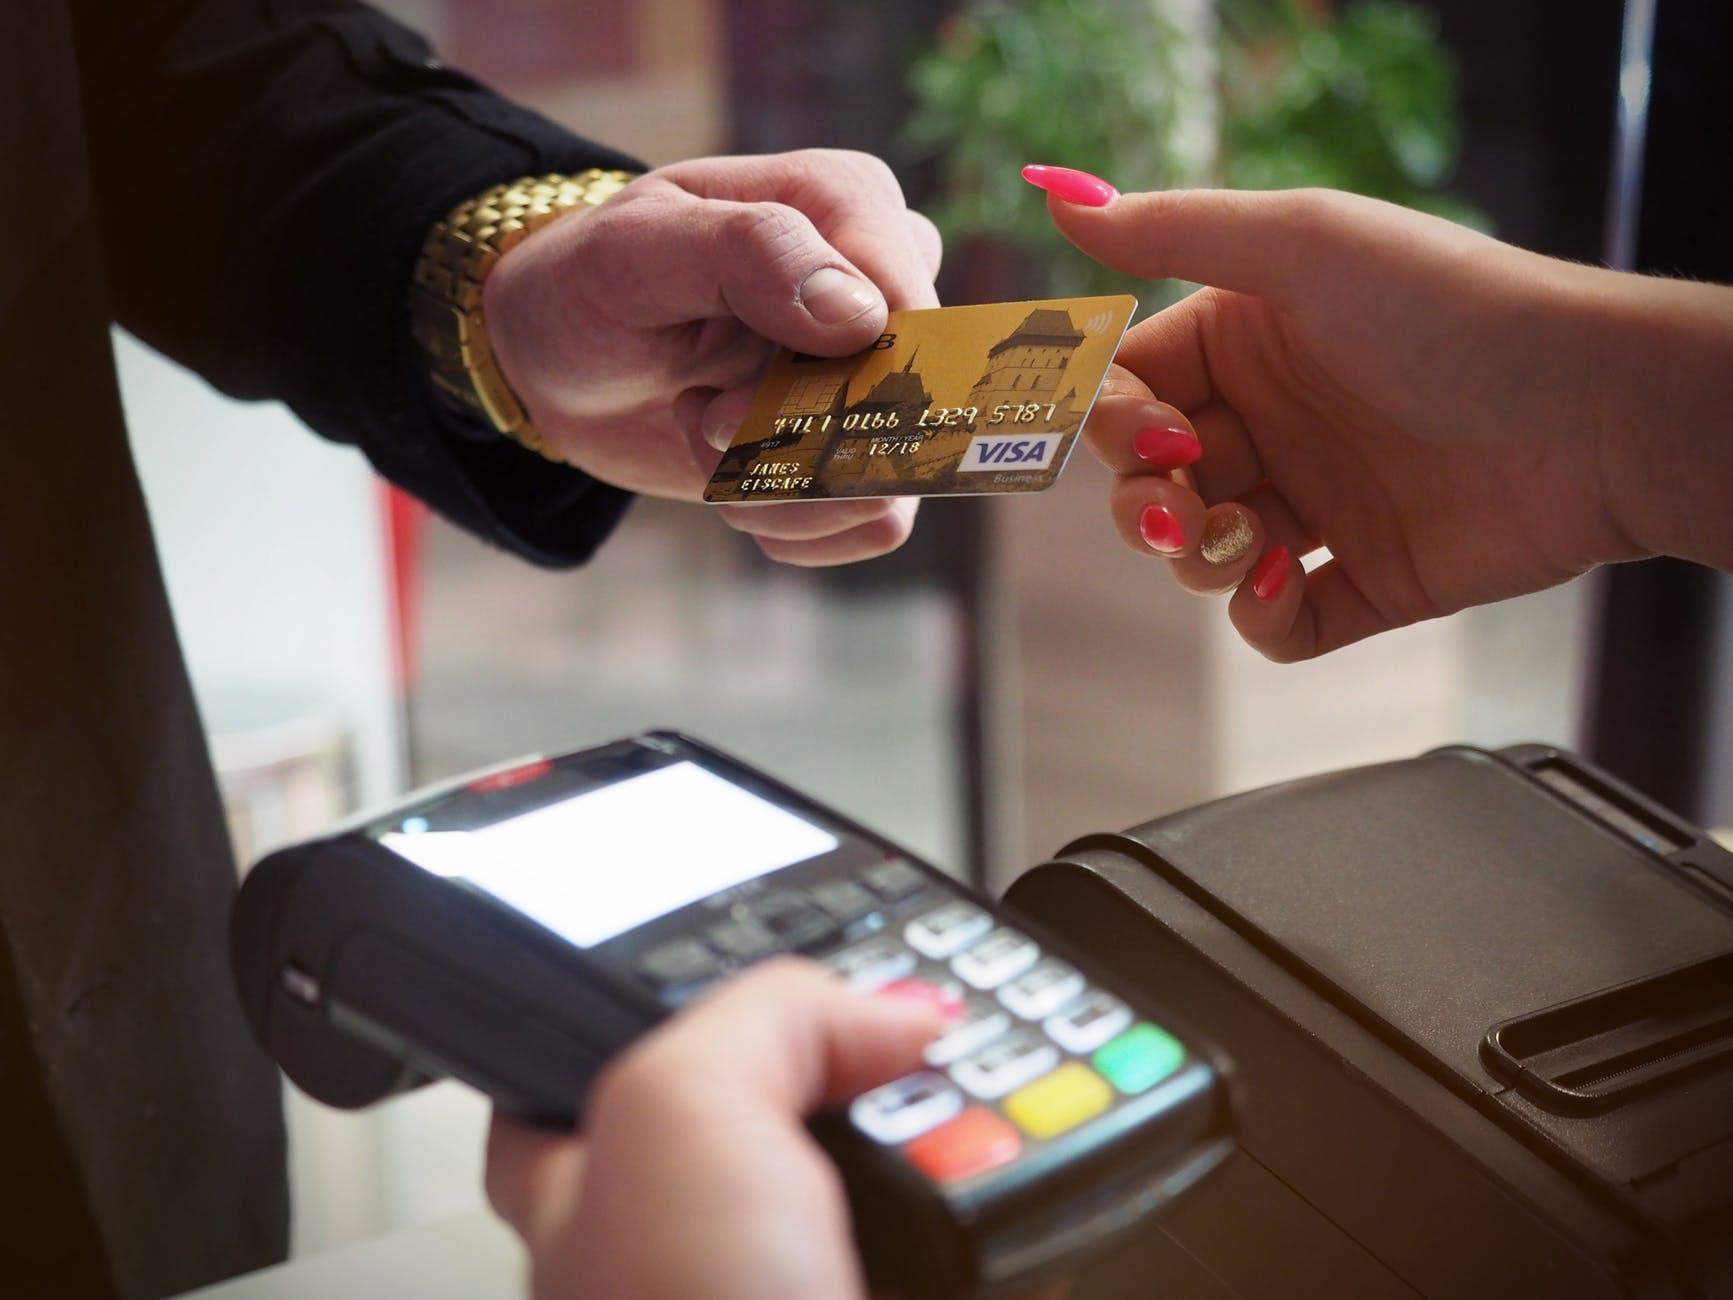 Jenis Kartu Kredit Tanpa Limit, Cuma Dimiliki Miliader Kelas Dunia